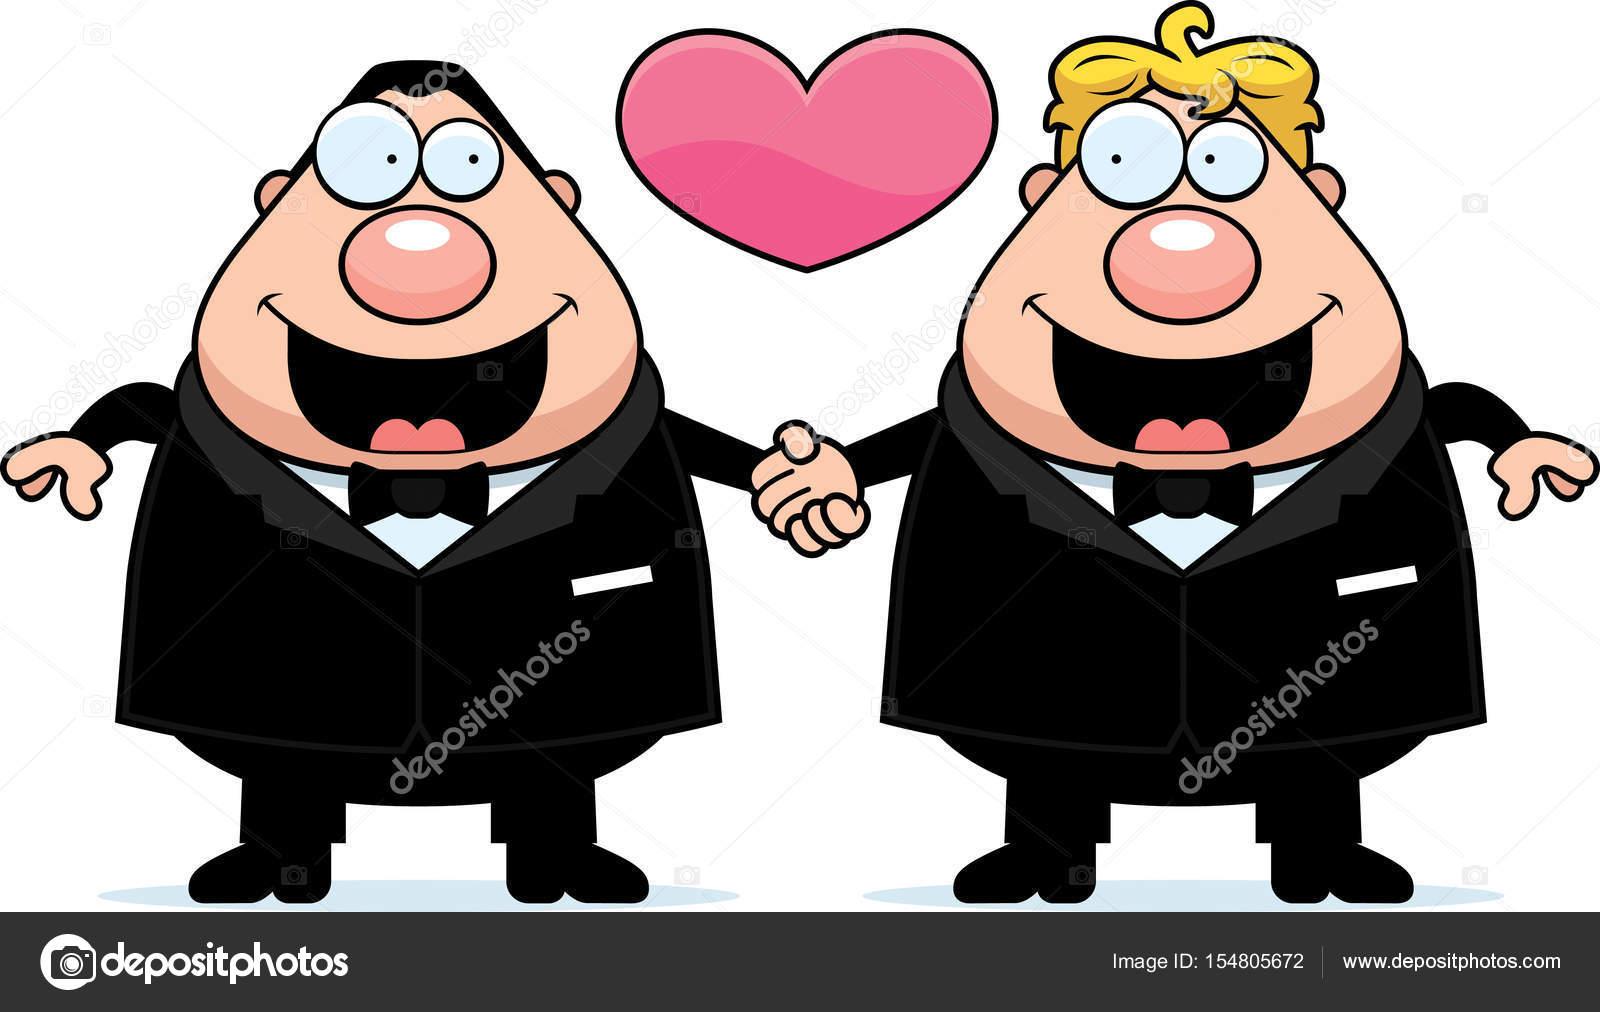 gratuit gay sexe dessins animés Collège lesbienne gicler